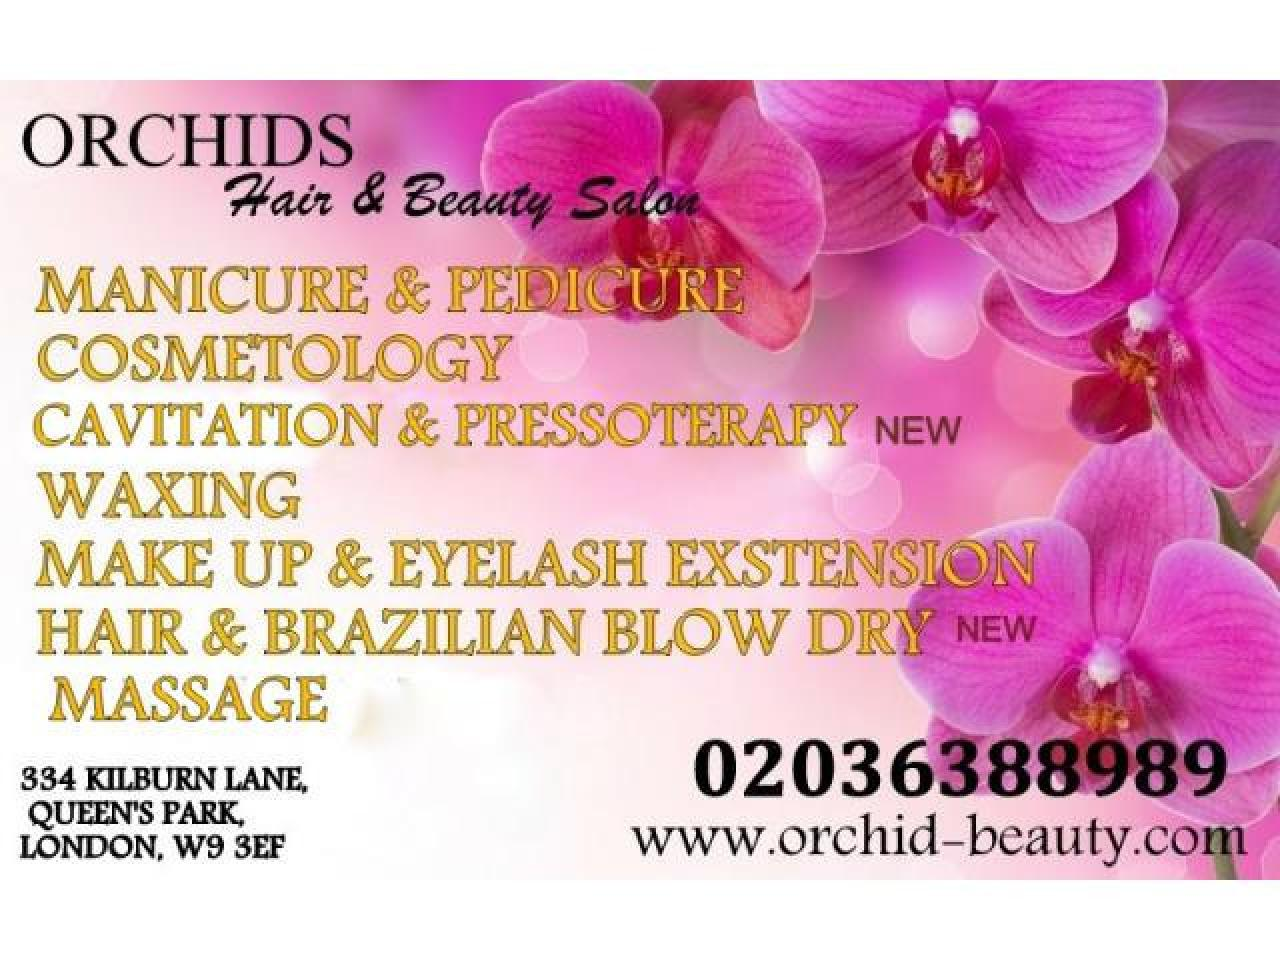 Orchids Hair & Beauty Salon - 1